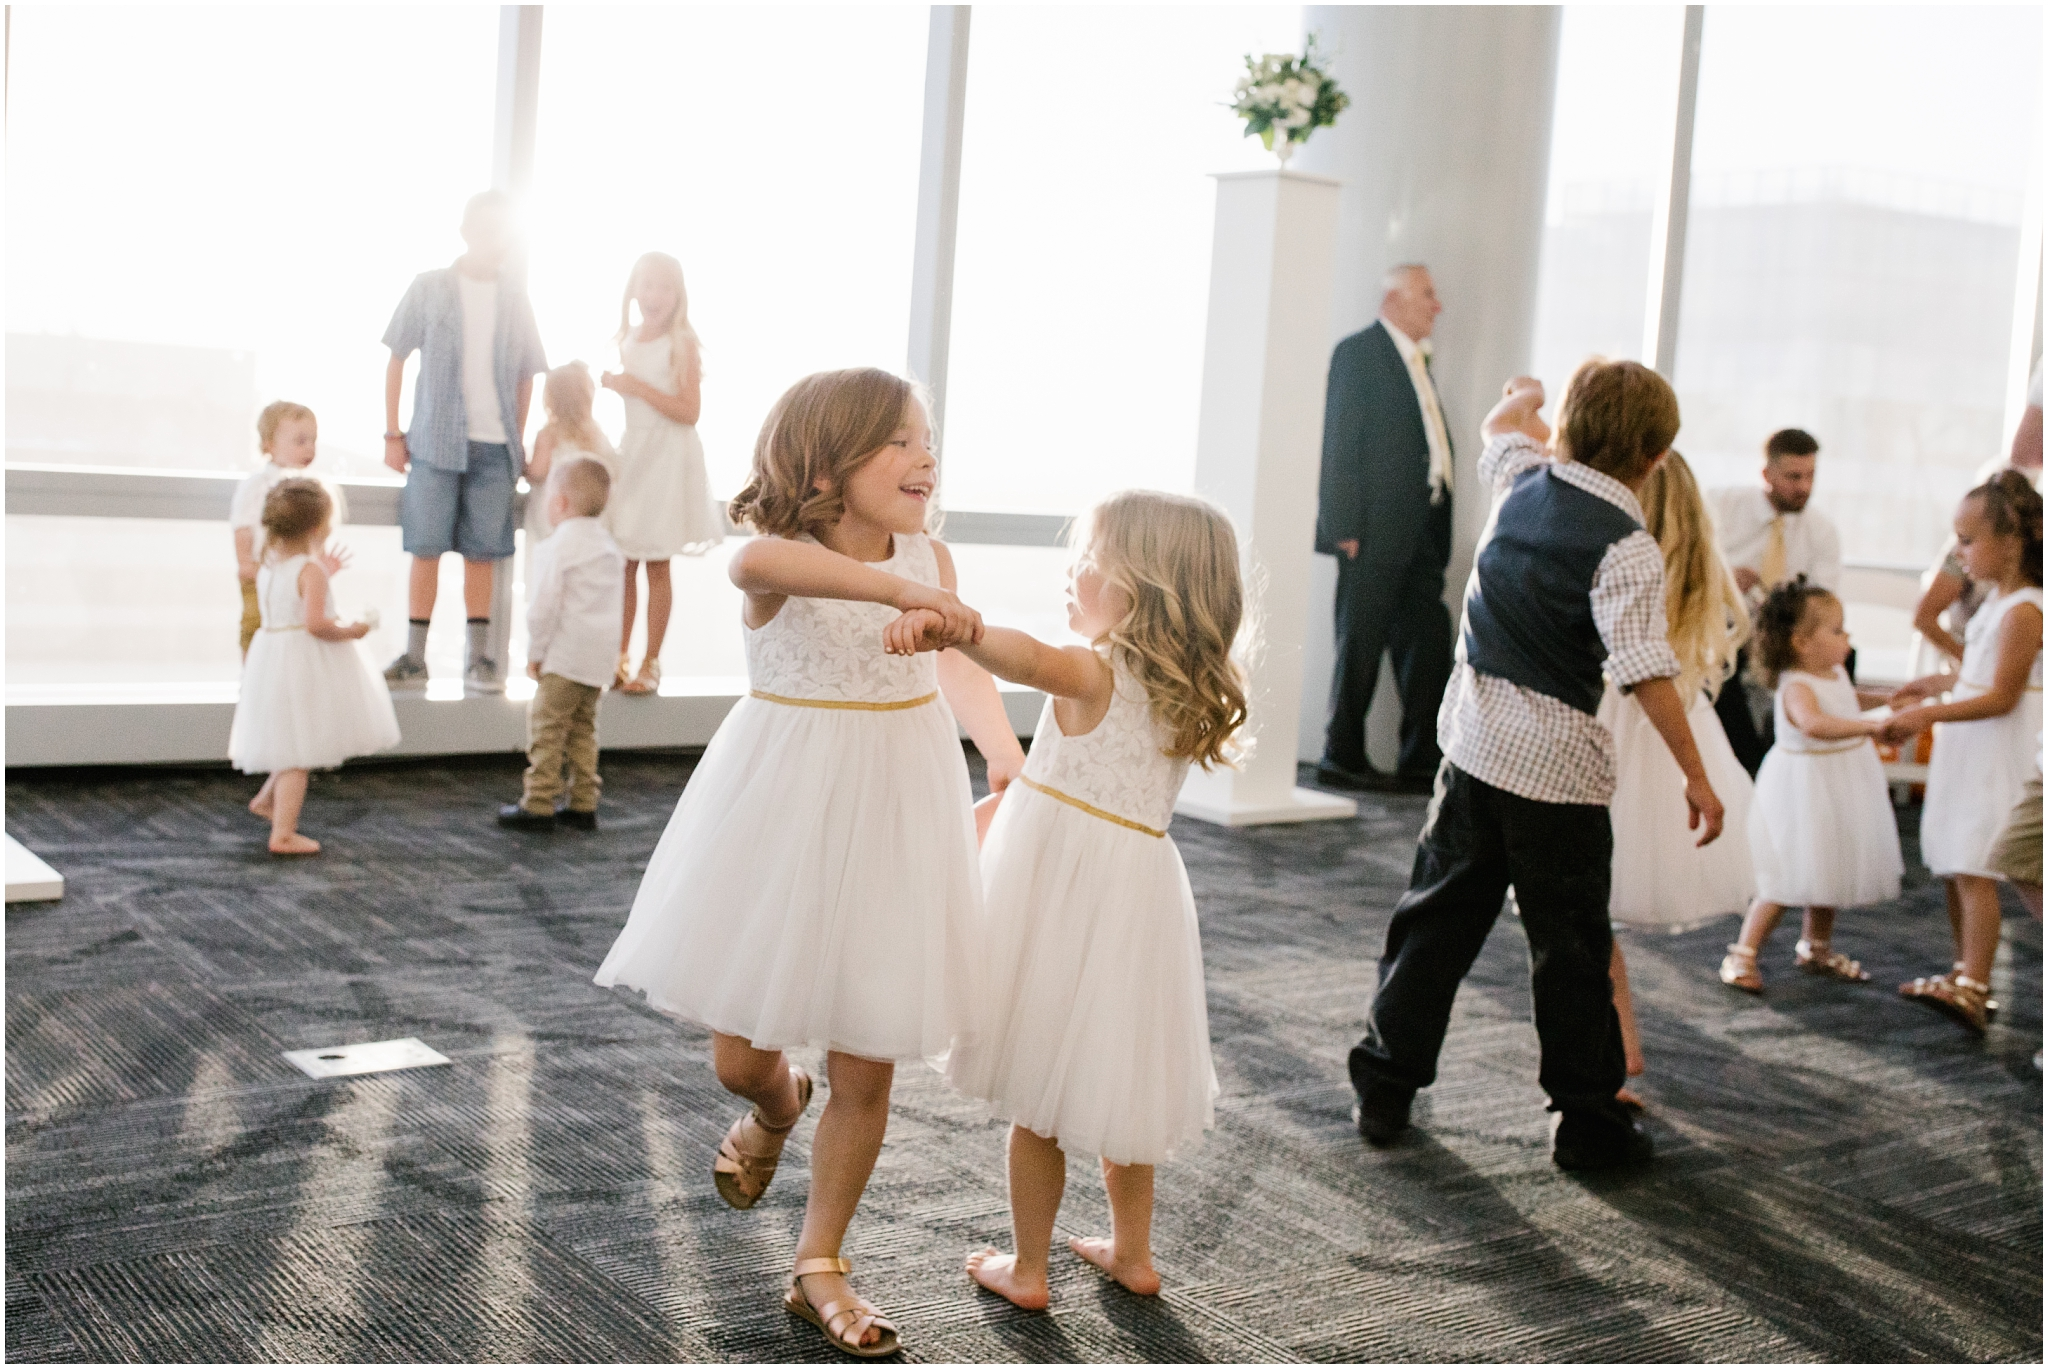 CherylandTyler-589_Lizzie-B-Imagery-Utah-Wedding-Photographer-Salt-Lake-City-Temple-Wells-Fargo-Building-Reception.jpg